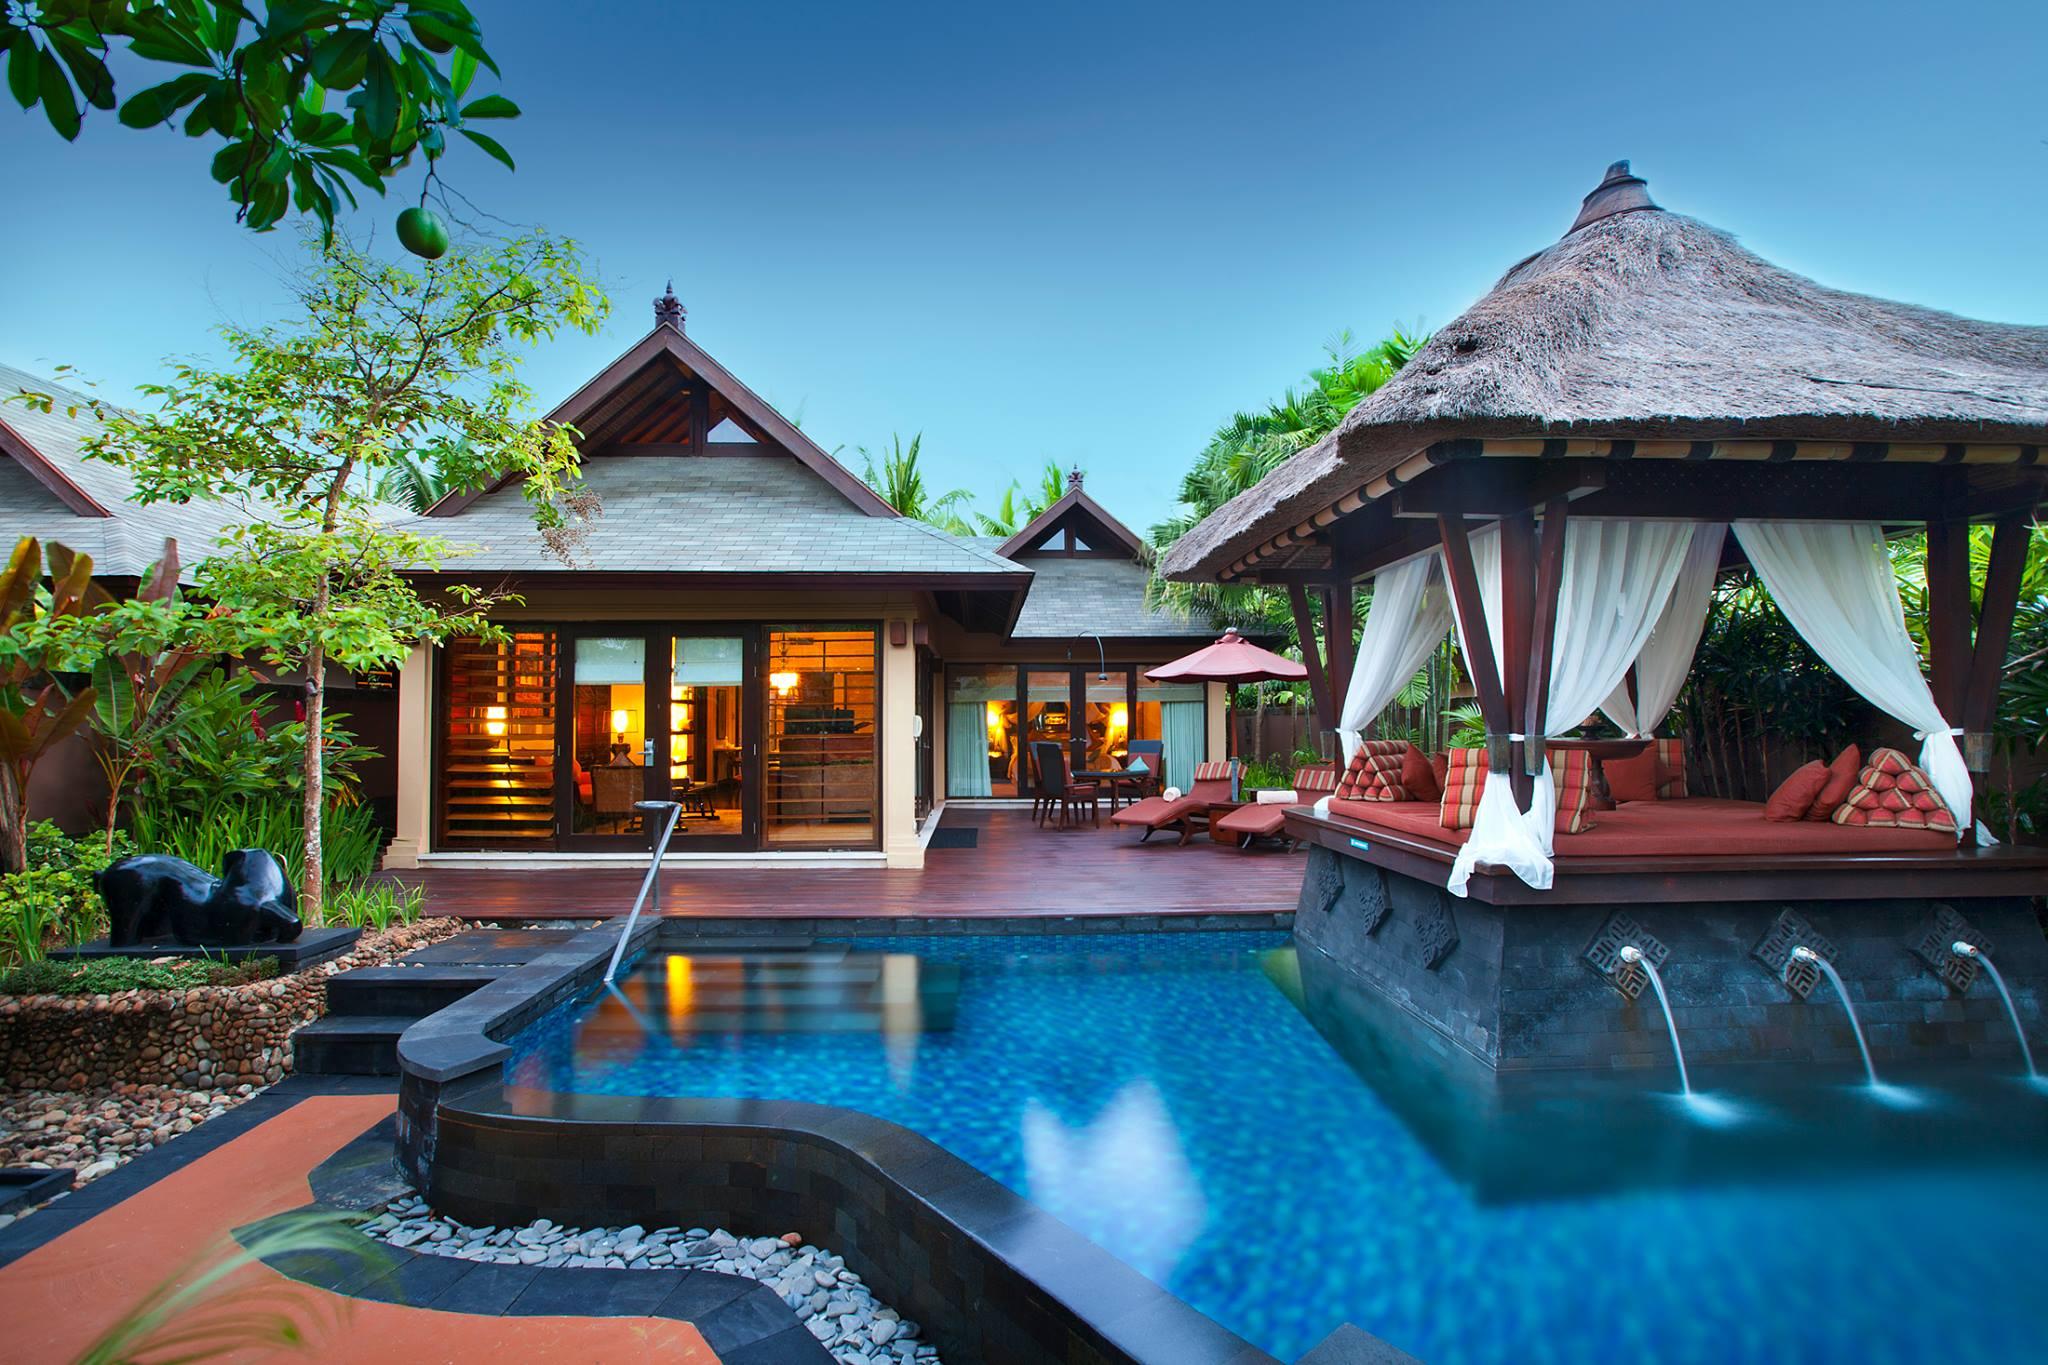 Photo of تور بالی اندونزی نوروز ۹۹ با ارزان ترین قیمت بازار خریداری کنید ؟ !